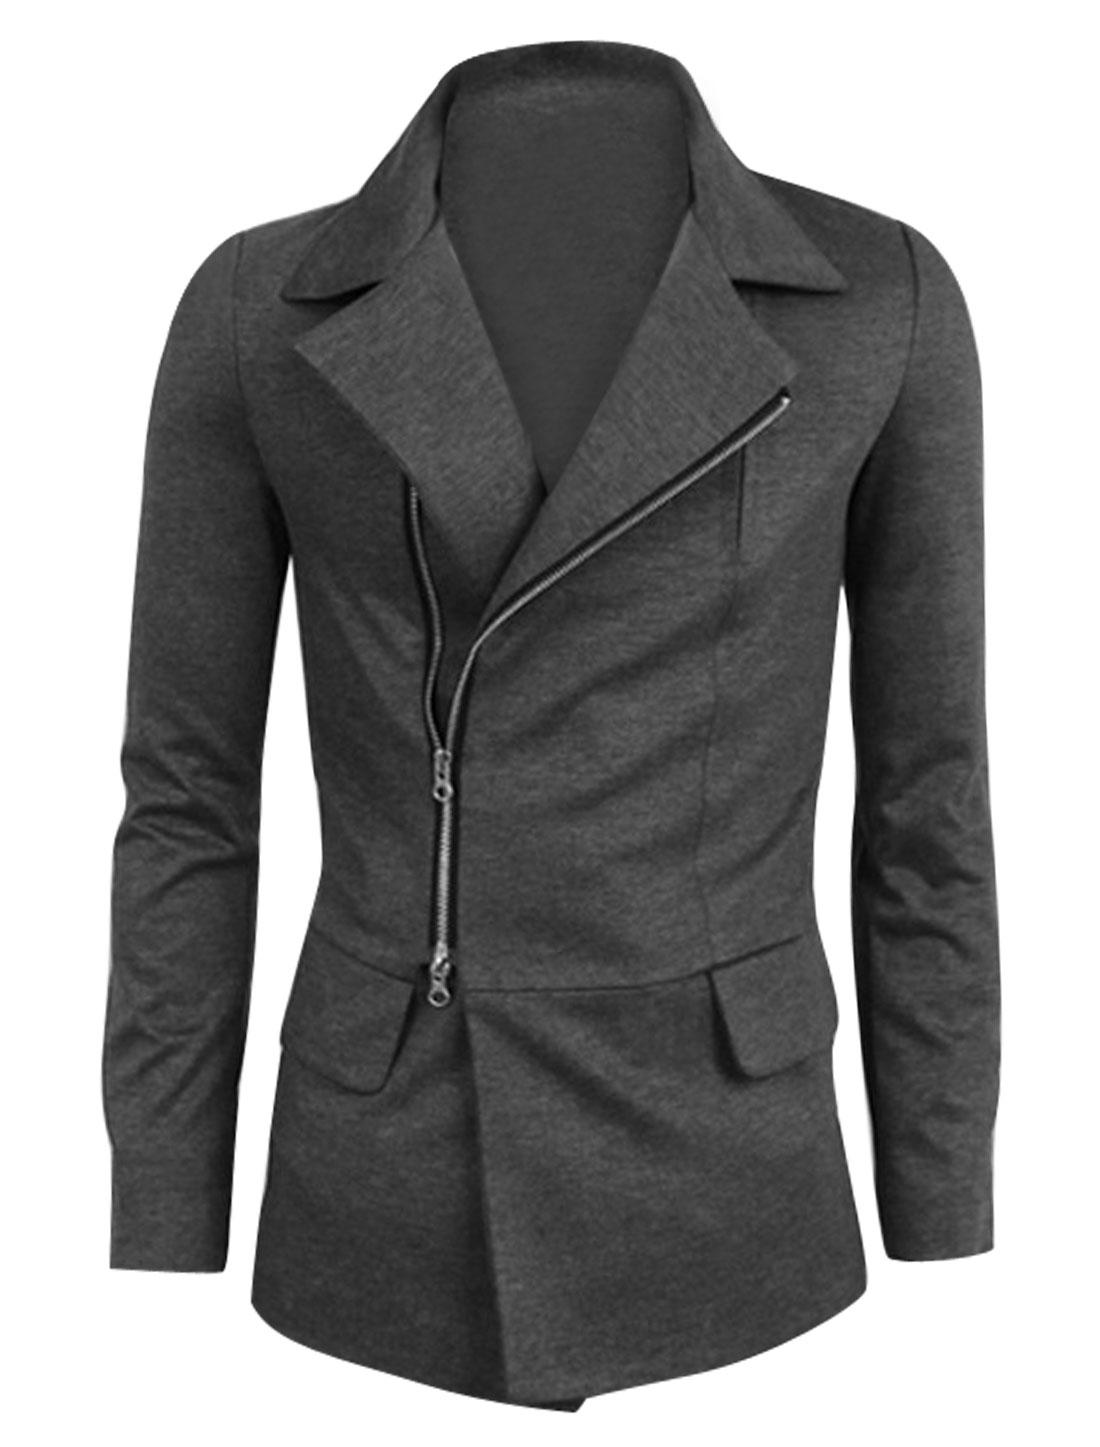 Men Convertibal Collar Flap Decor Full Zip Casual Jacket Dark Gray M